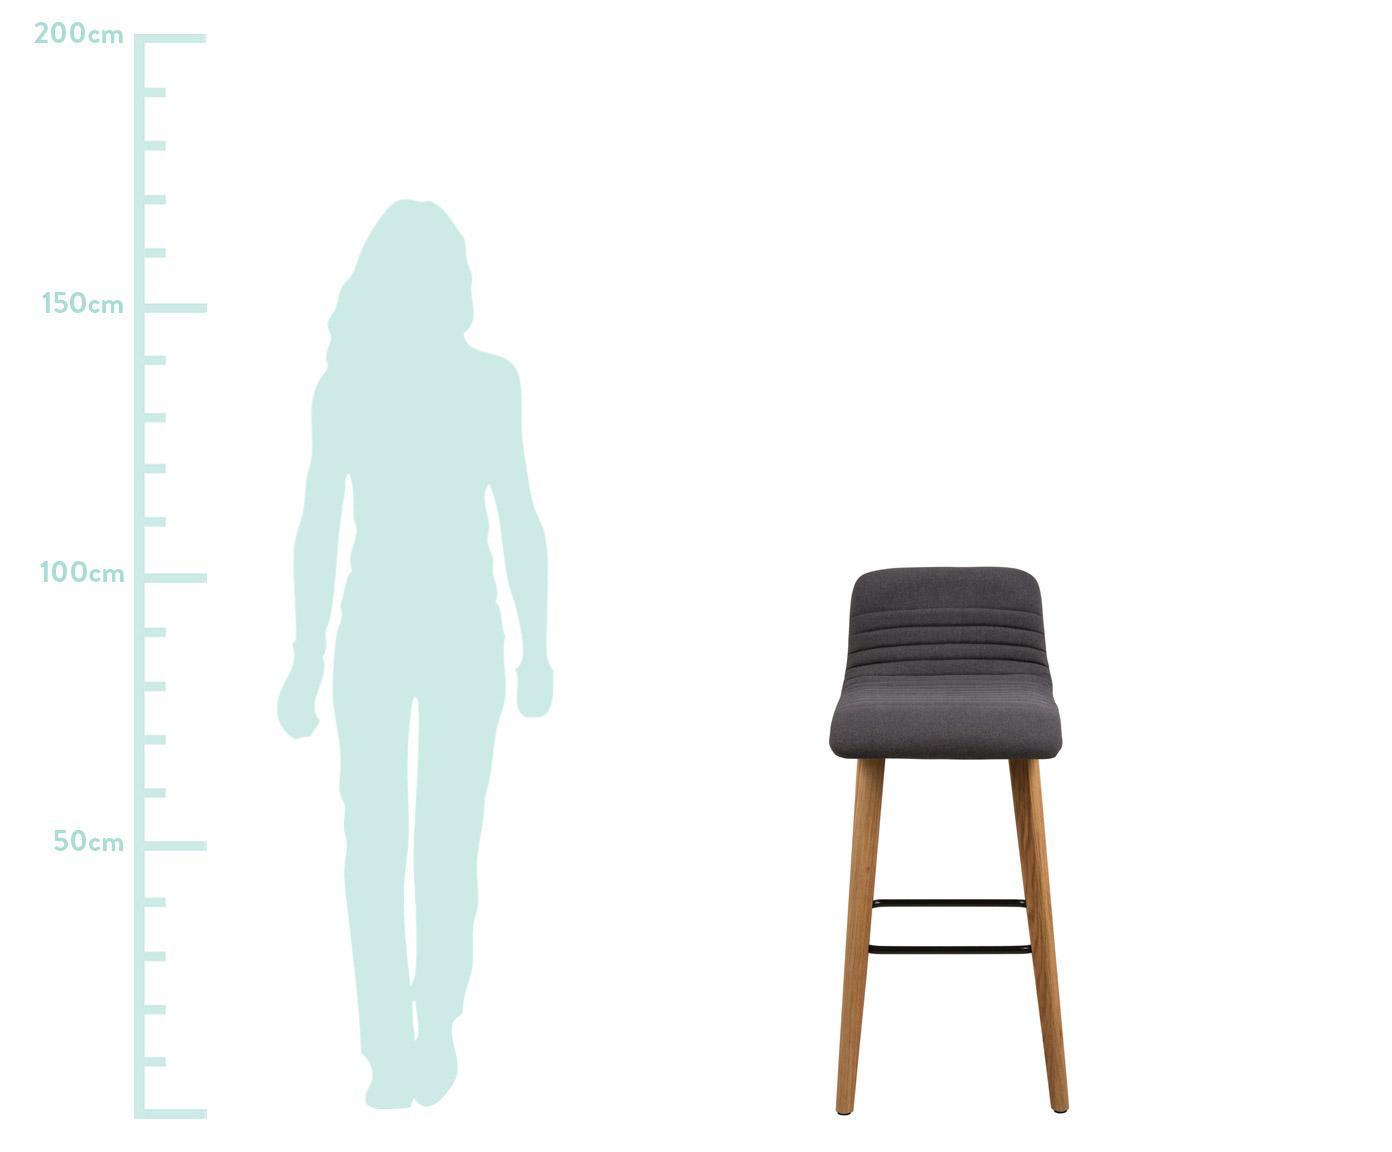 Barstuhl Arosa, Bezug: Polyester, Beine: Eichenholz, Sitzschale: Sperrholz, Bezug: Anthrazit<br>Beine: Eichenholz<br>Fußstütze: Schwarz, 44 x 101 cm